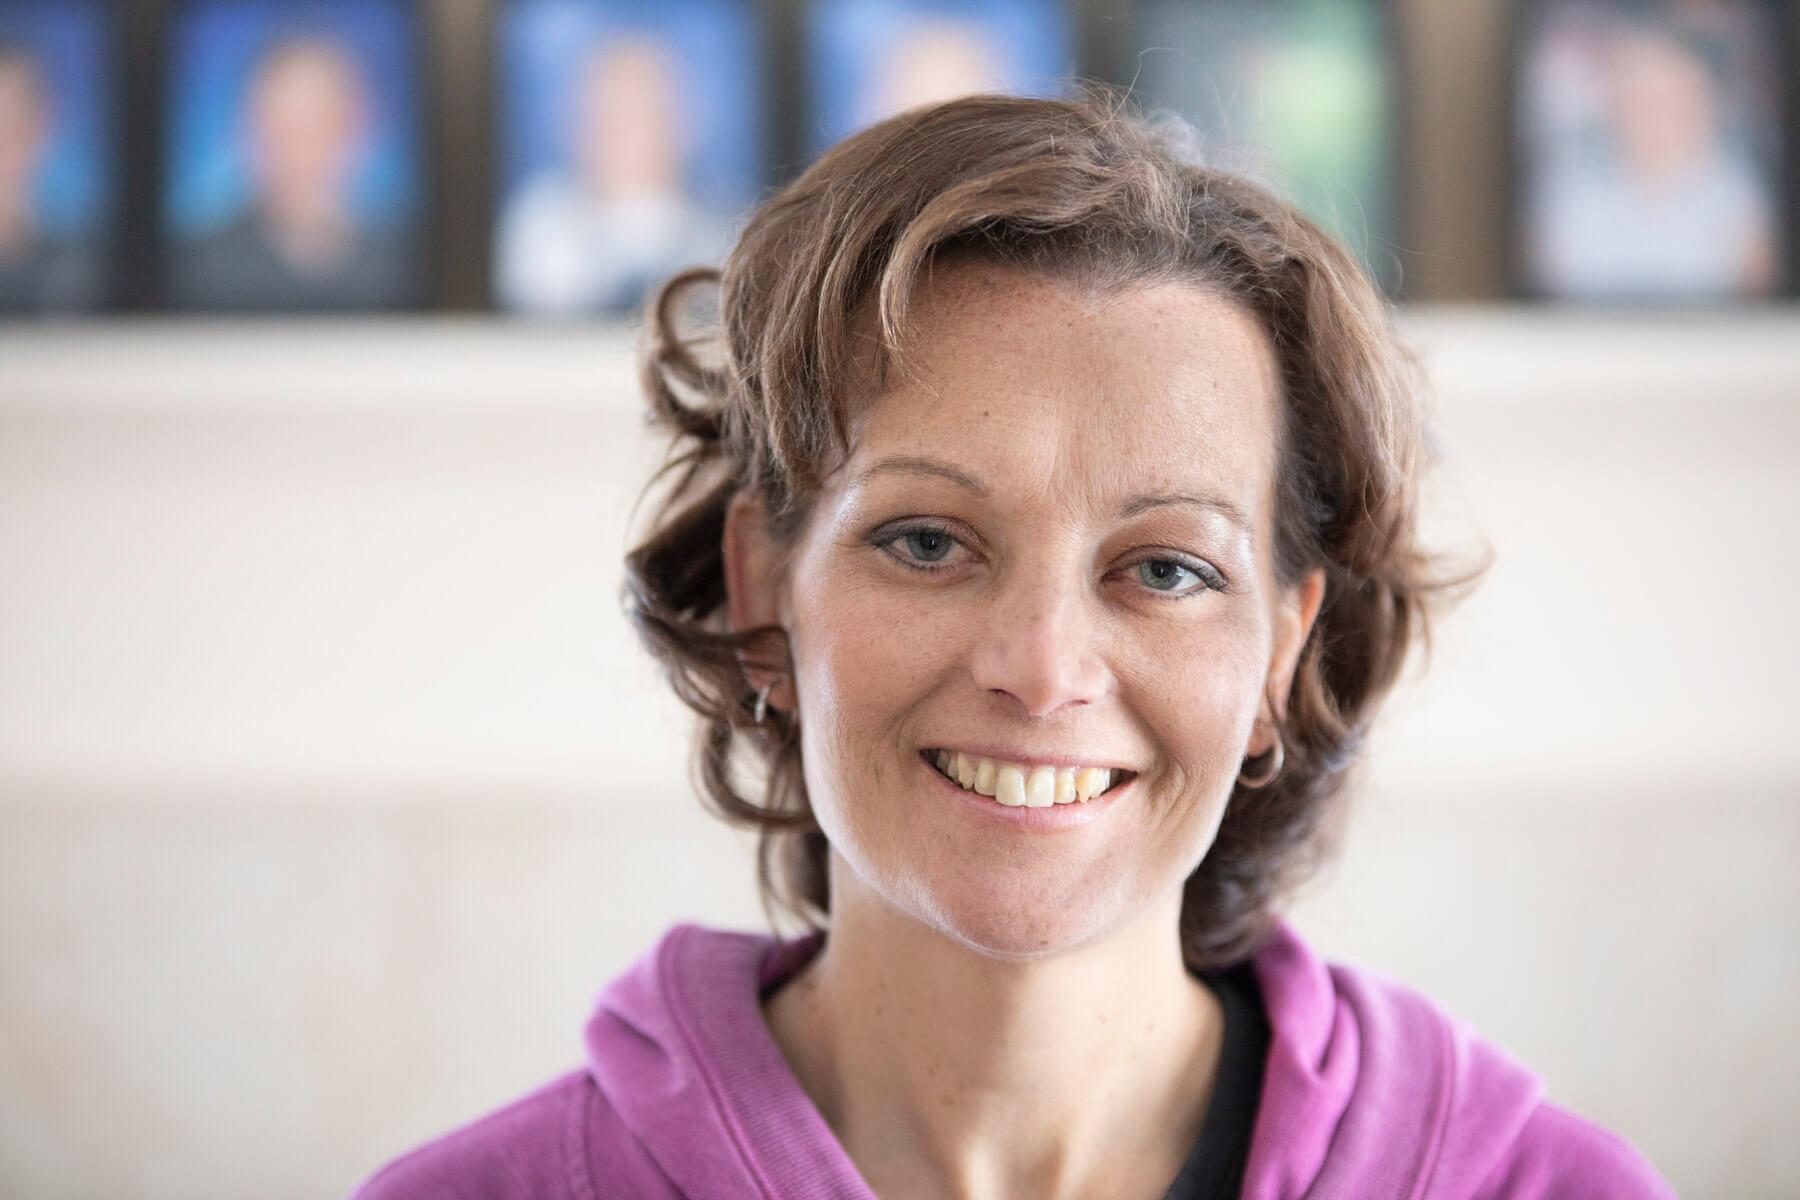 Jillian O'Connor, diagnosed with metastatic breast cancer